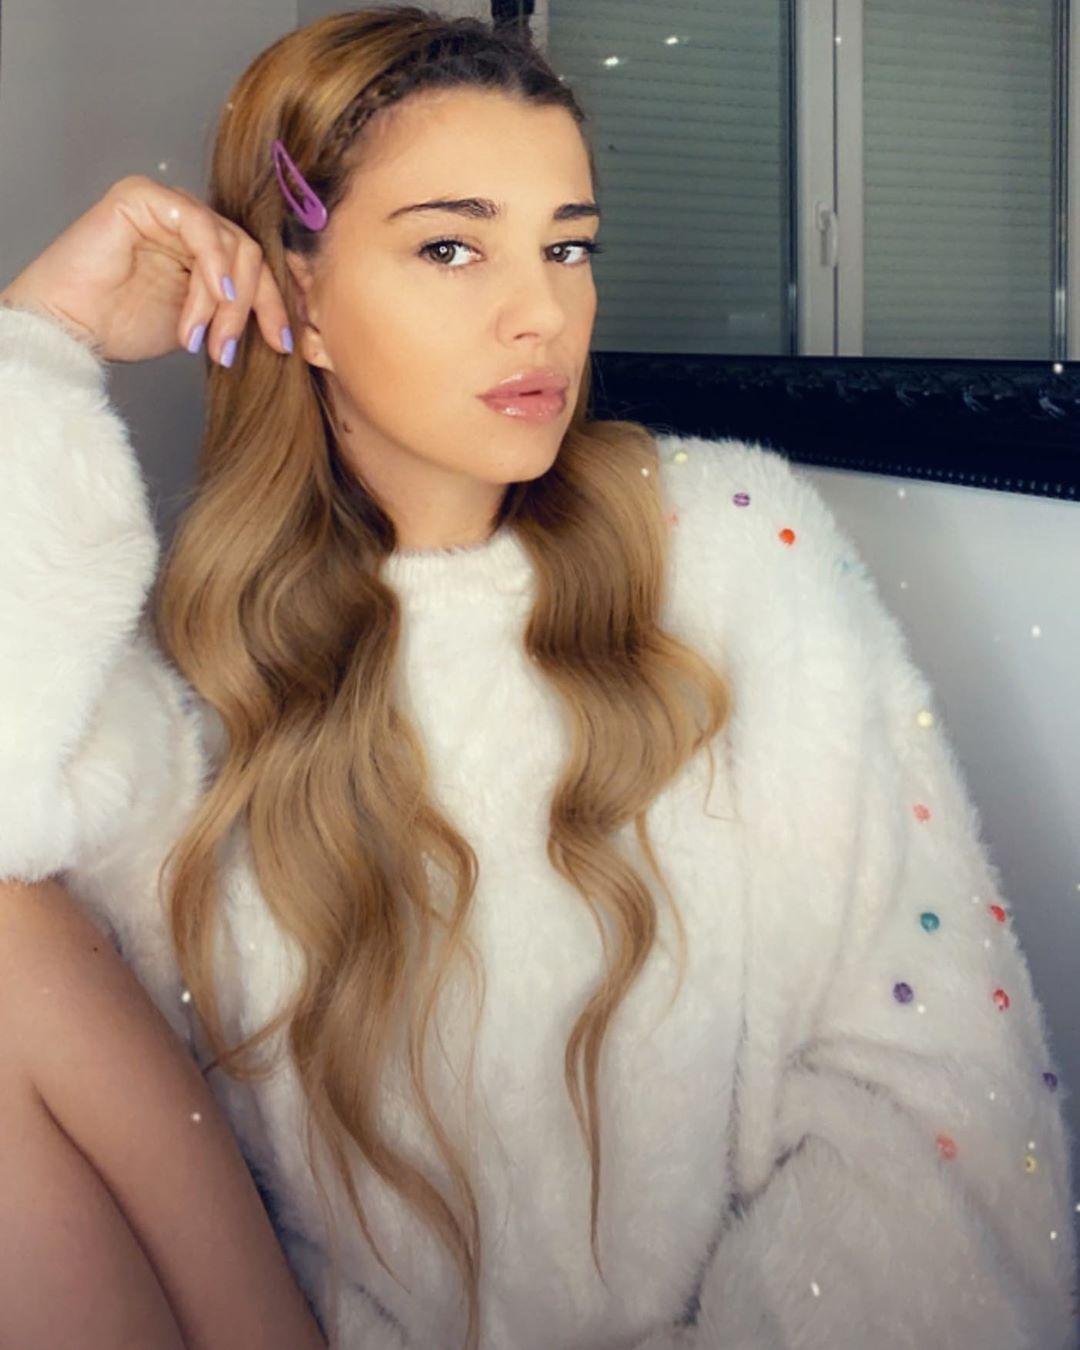 Kija Kockar pozirala u donjem vešu: Pevačica ima telo boginje! (FOTO)